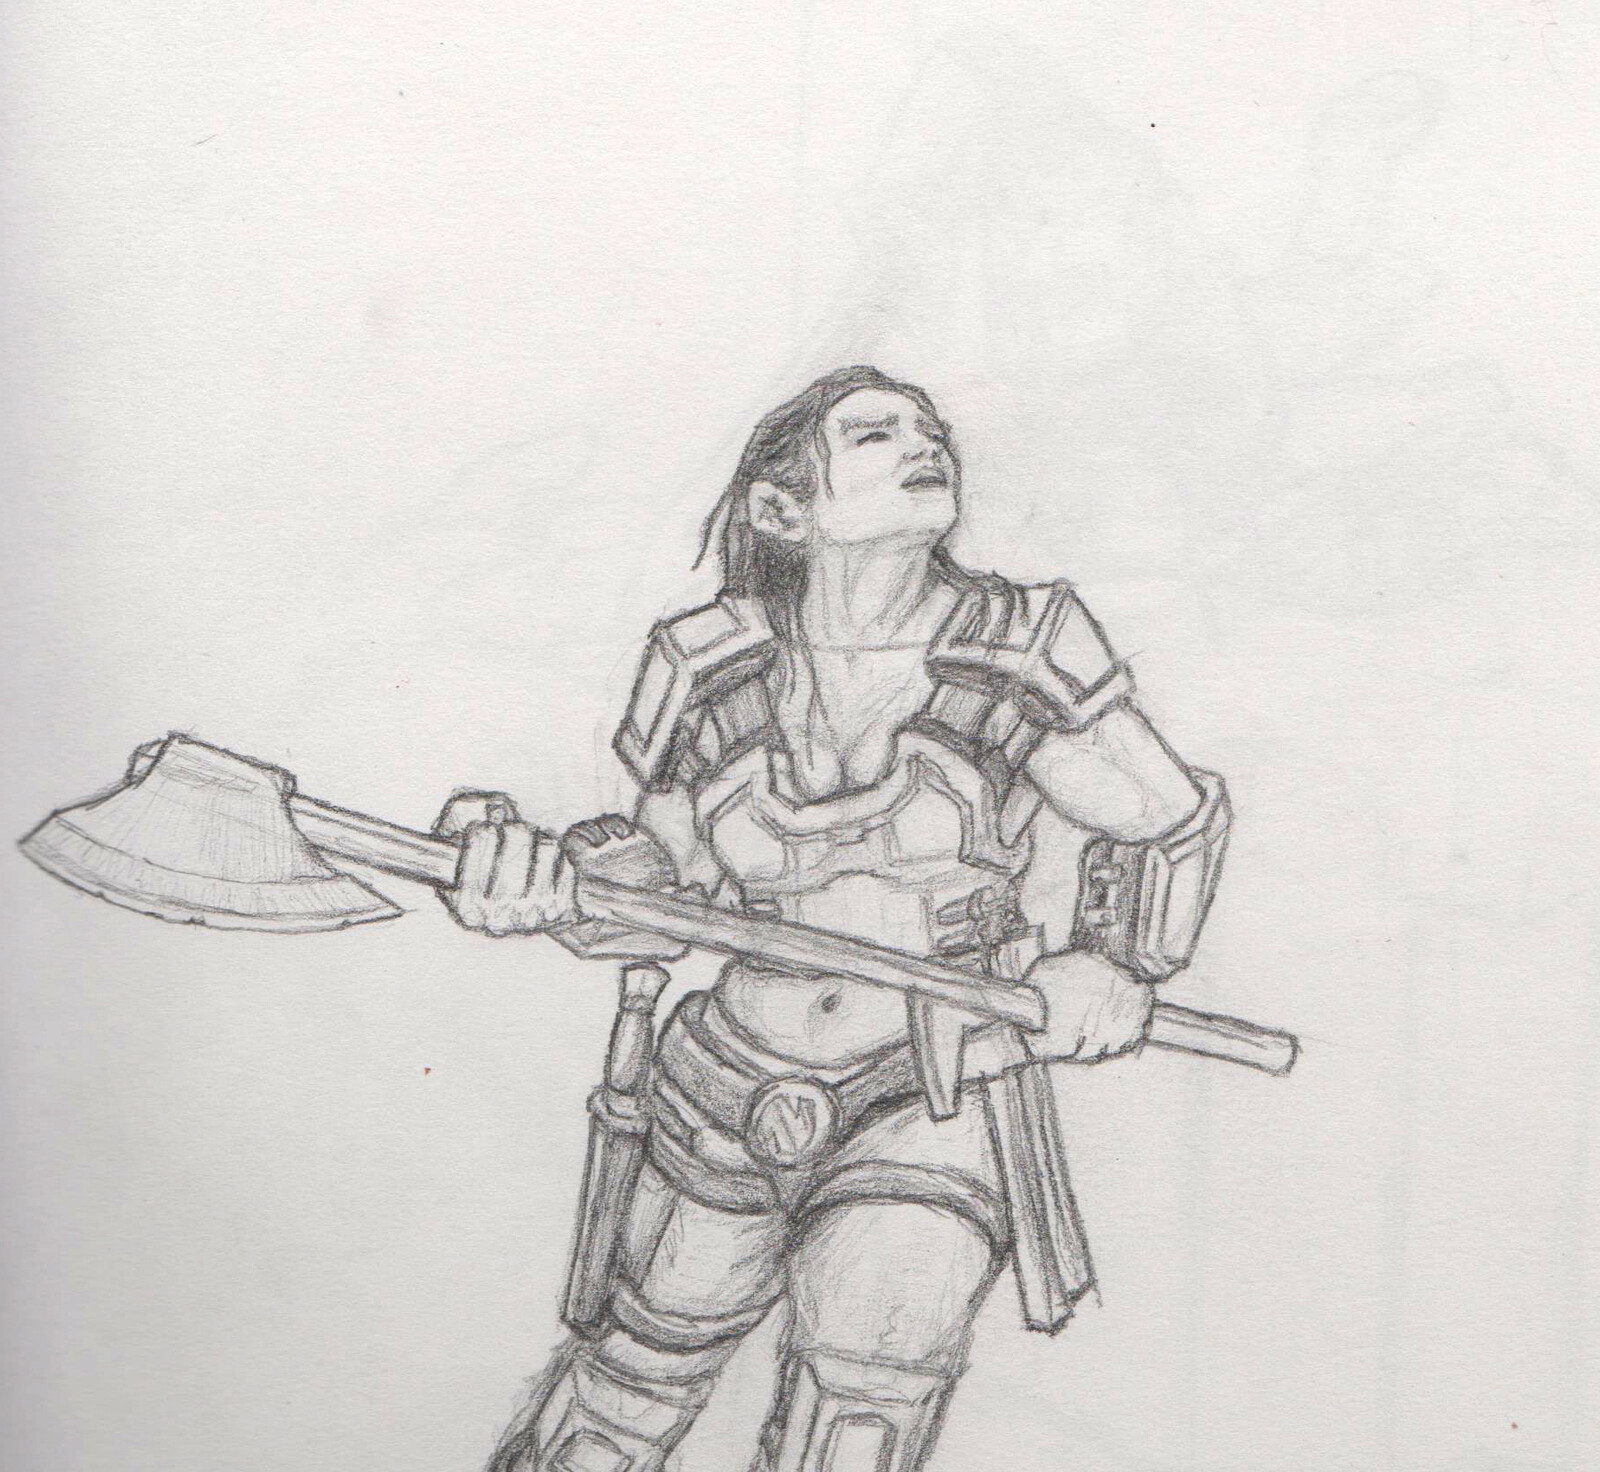 Dwarf facing larger opponent